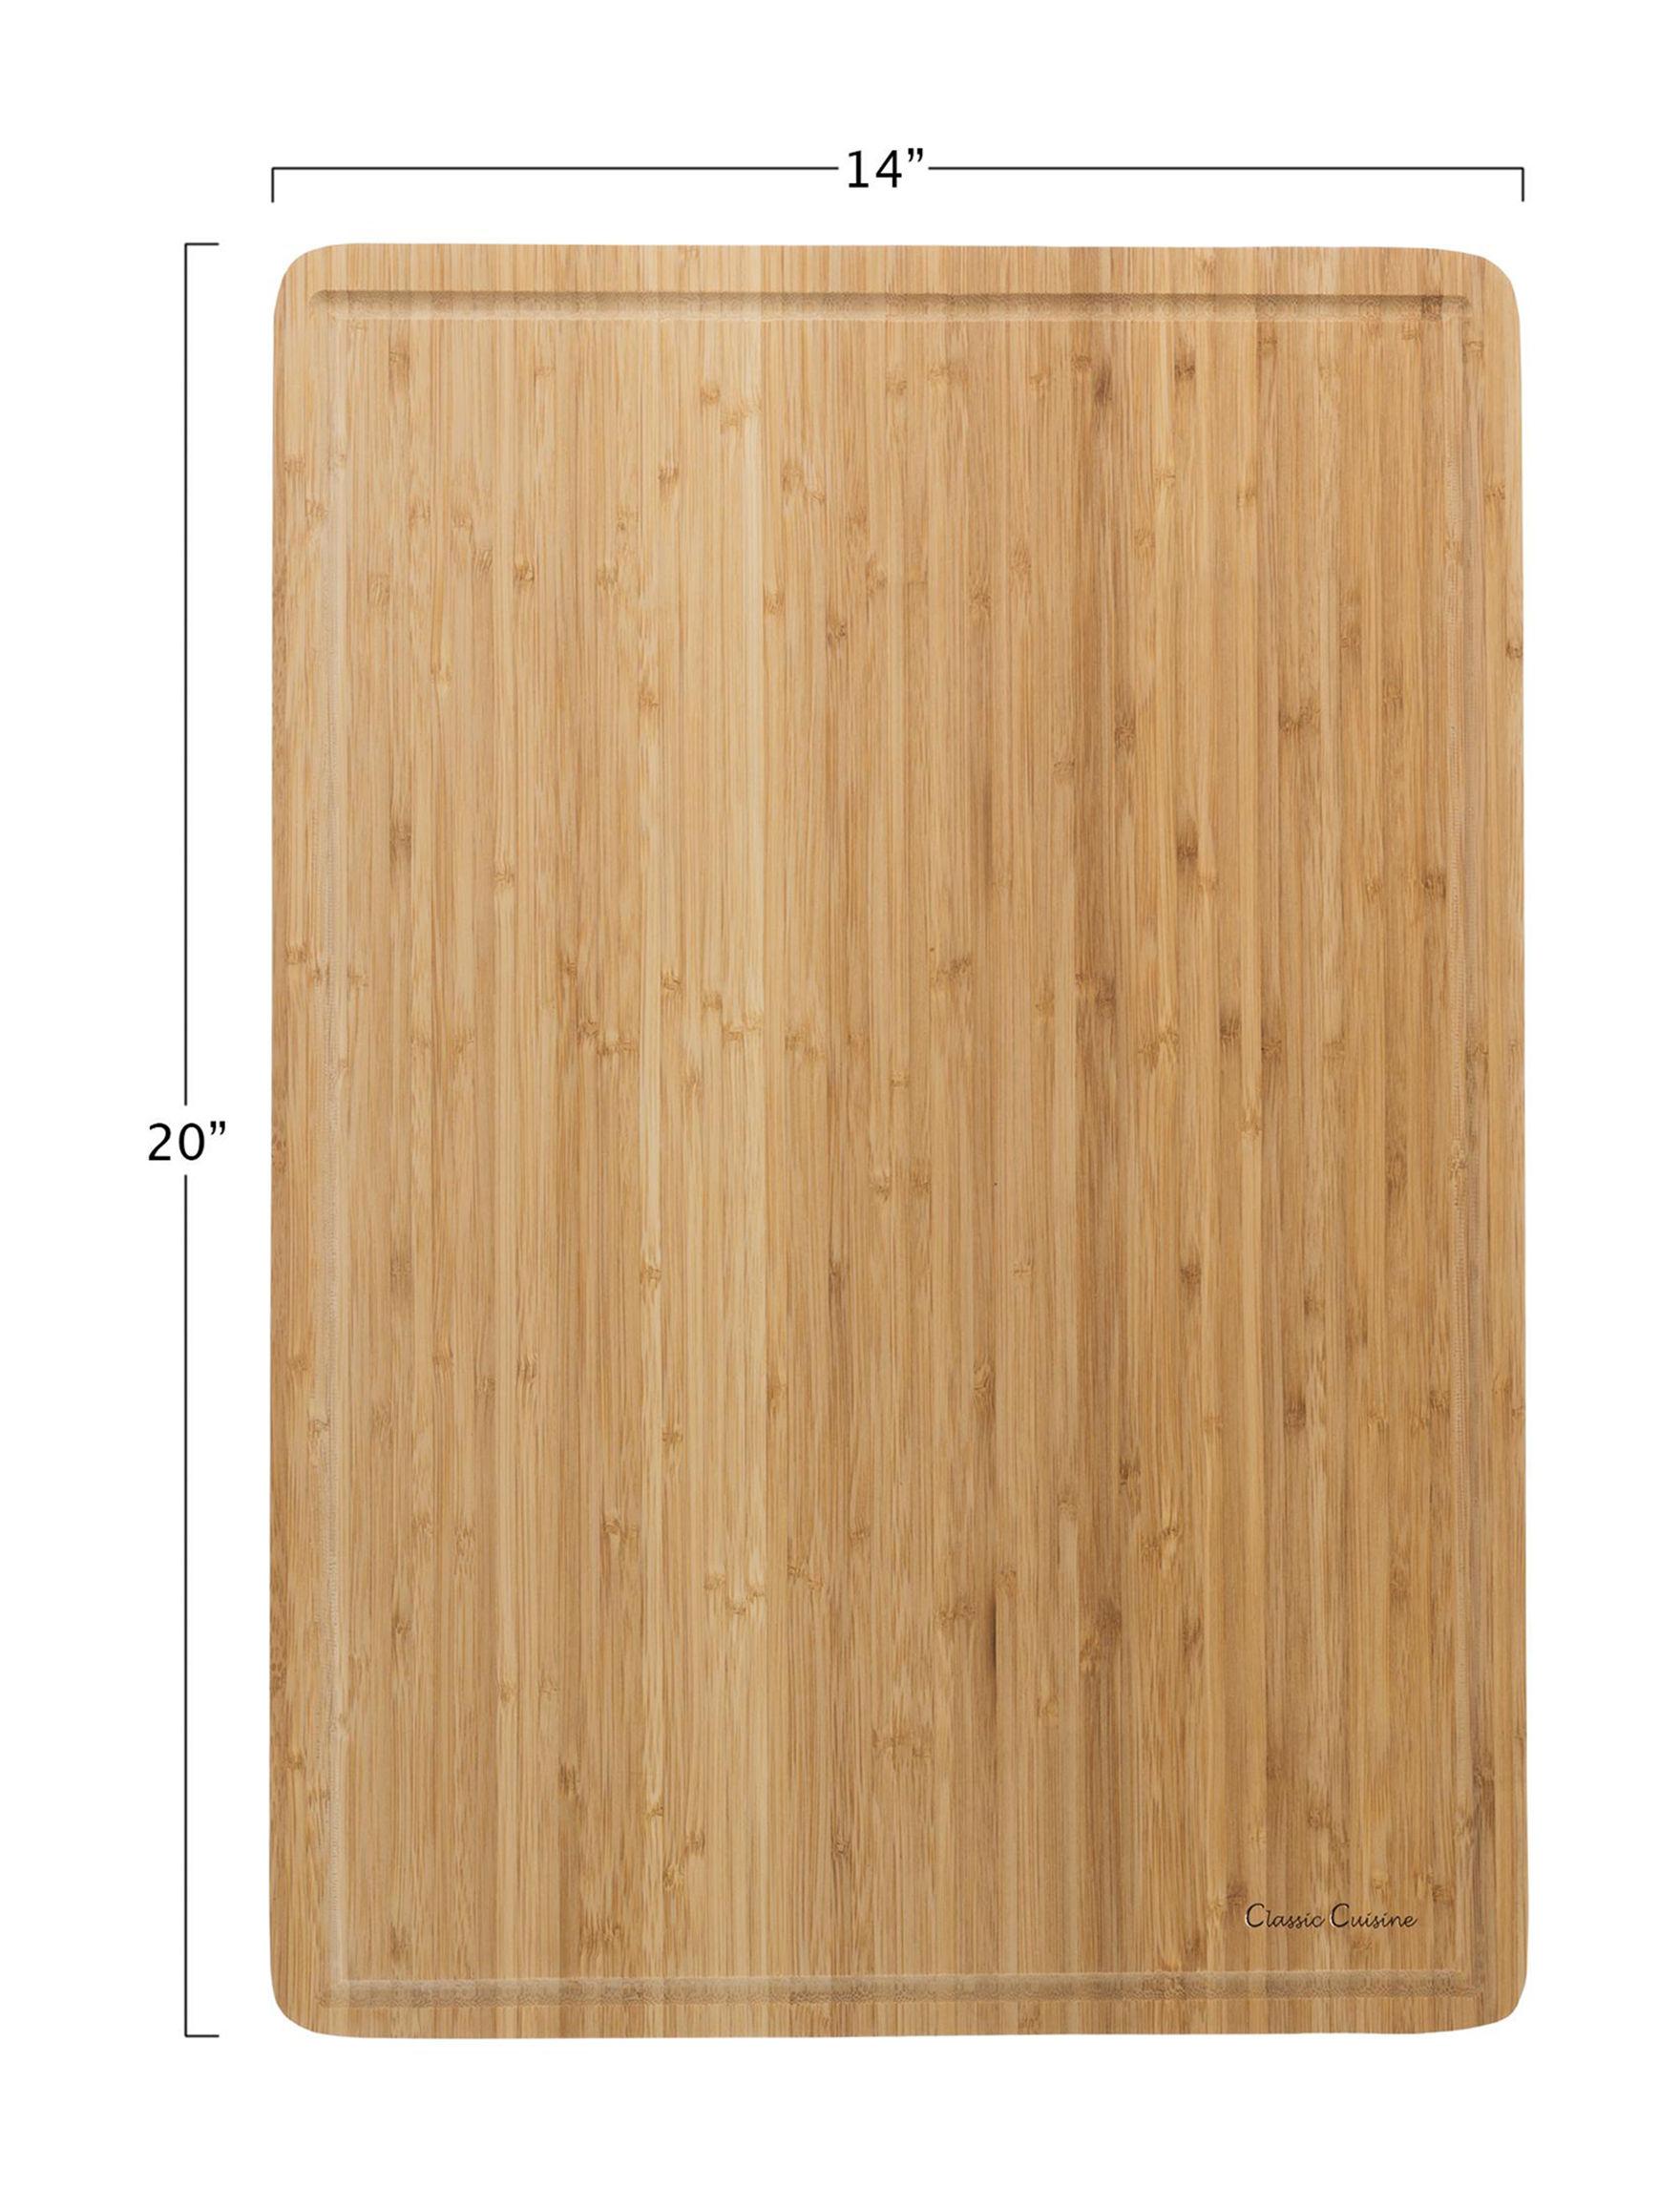 Classic Cuisine Bamboo Cutting Boards Prep & Tools